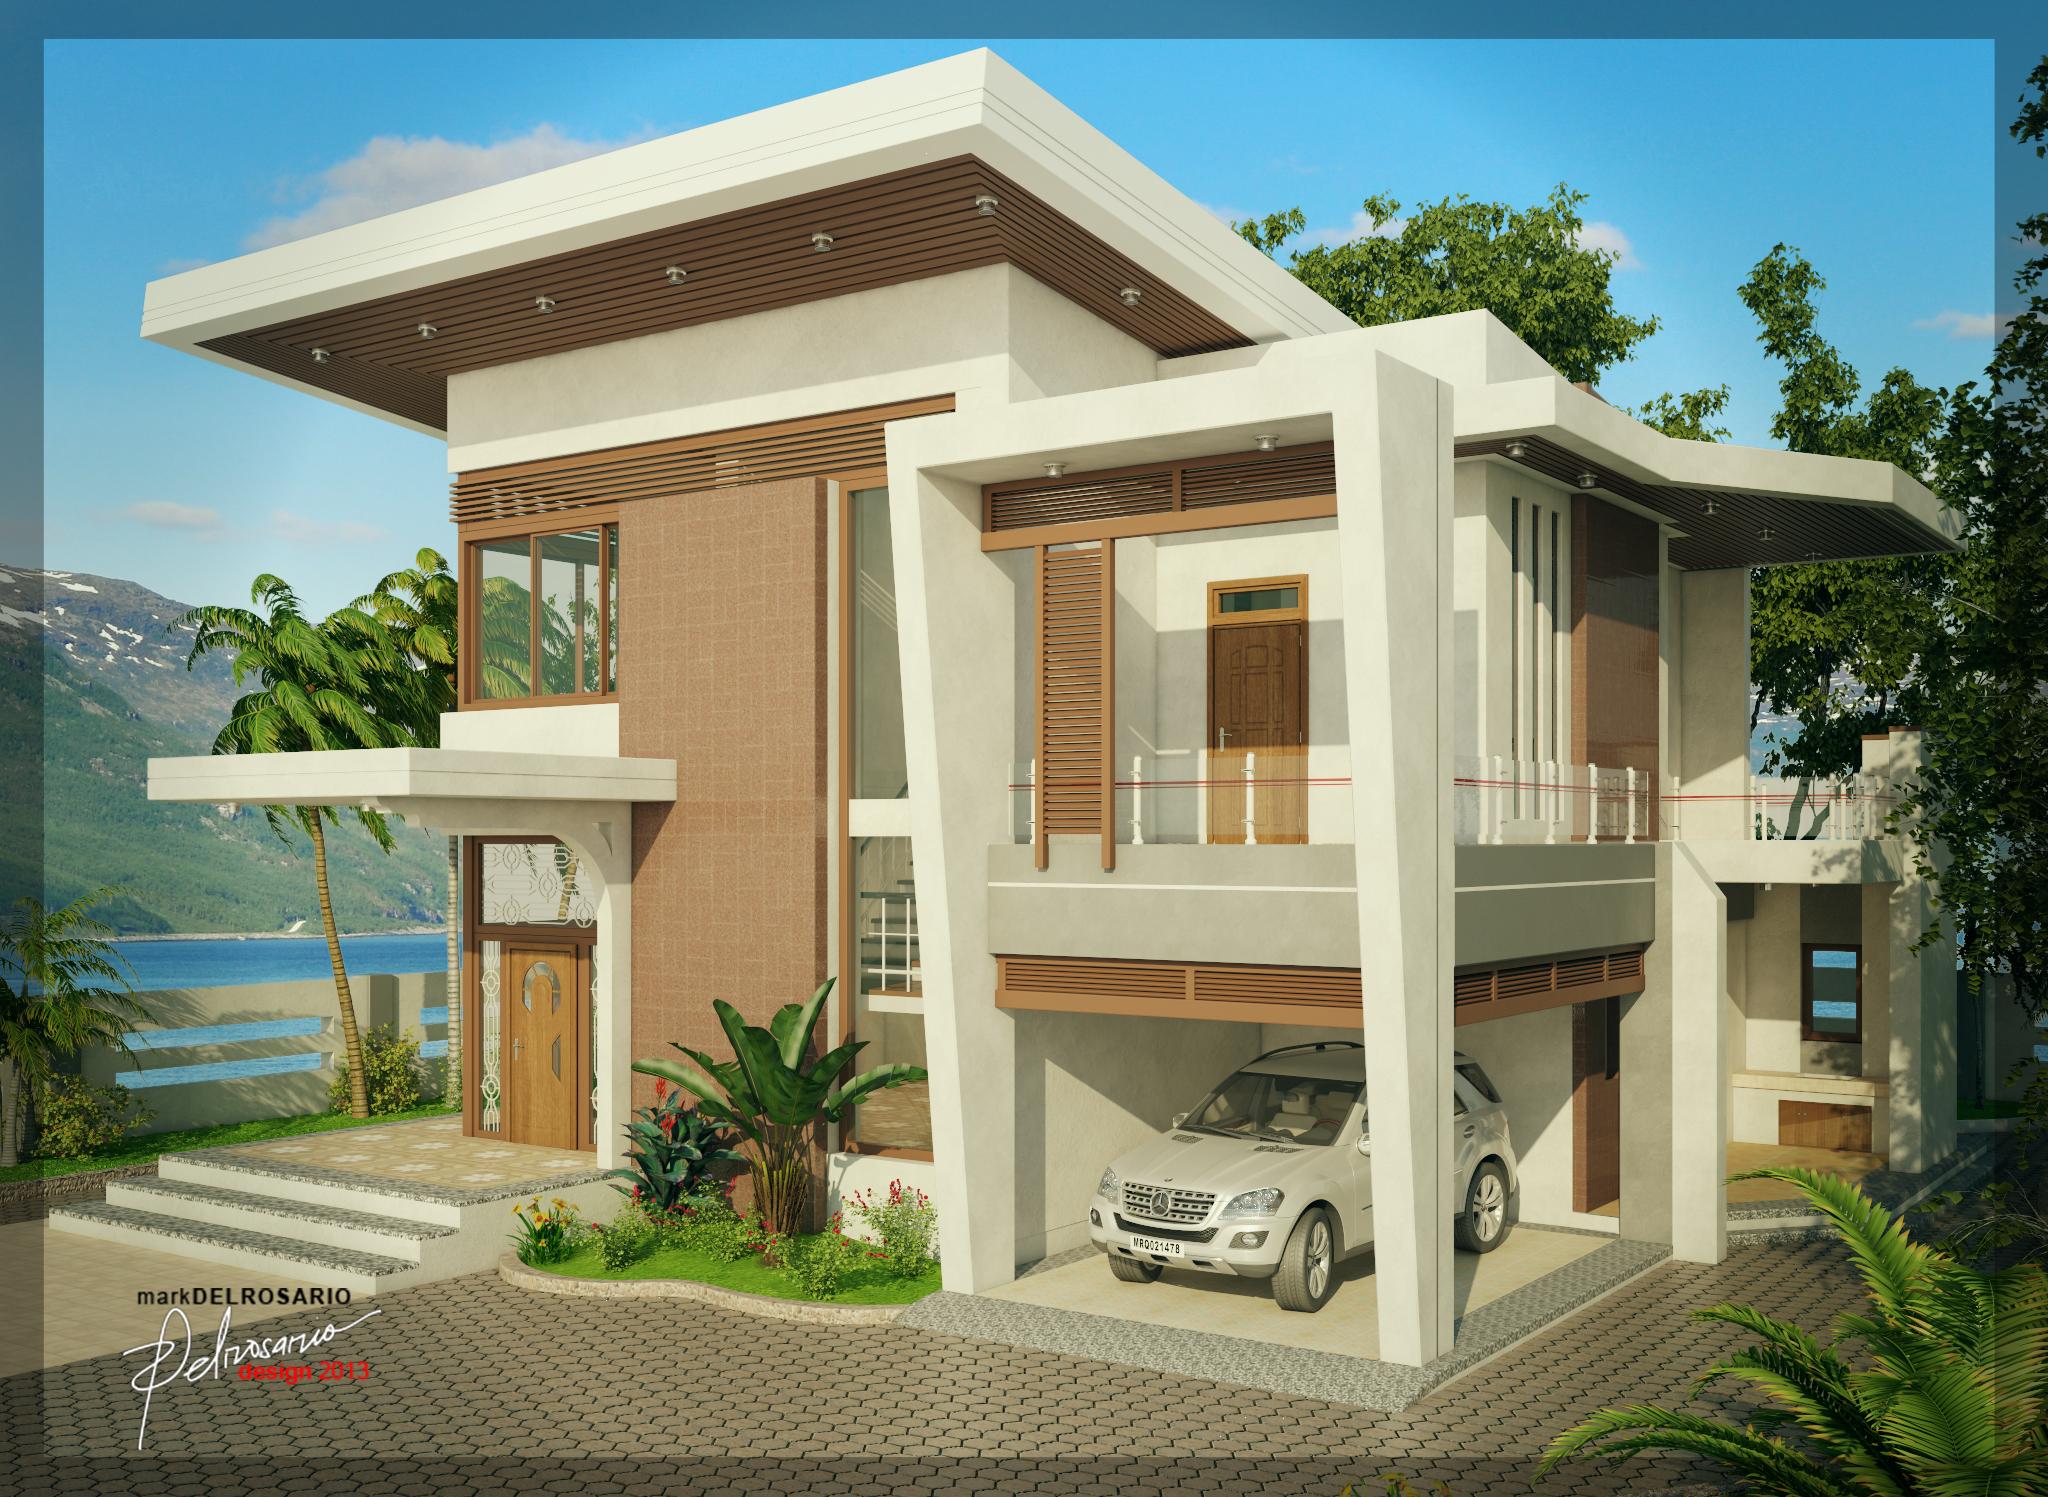 markdelrosarioDesign  3D  Graphic Design